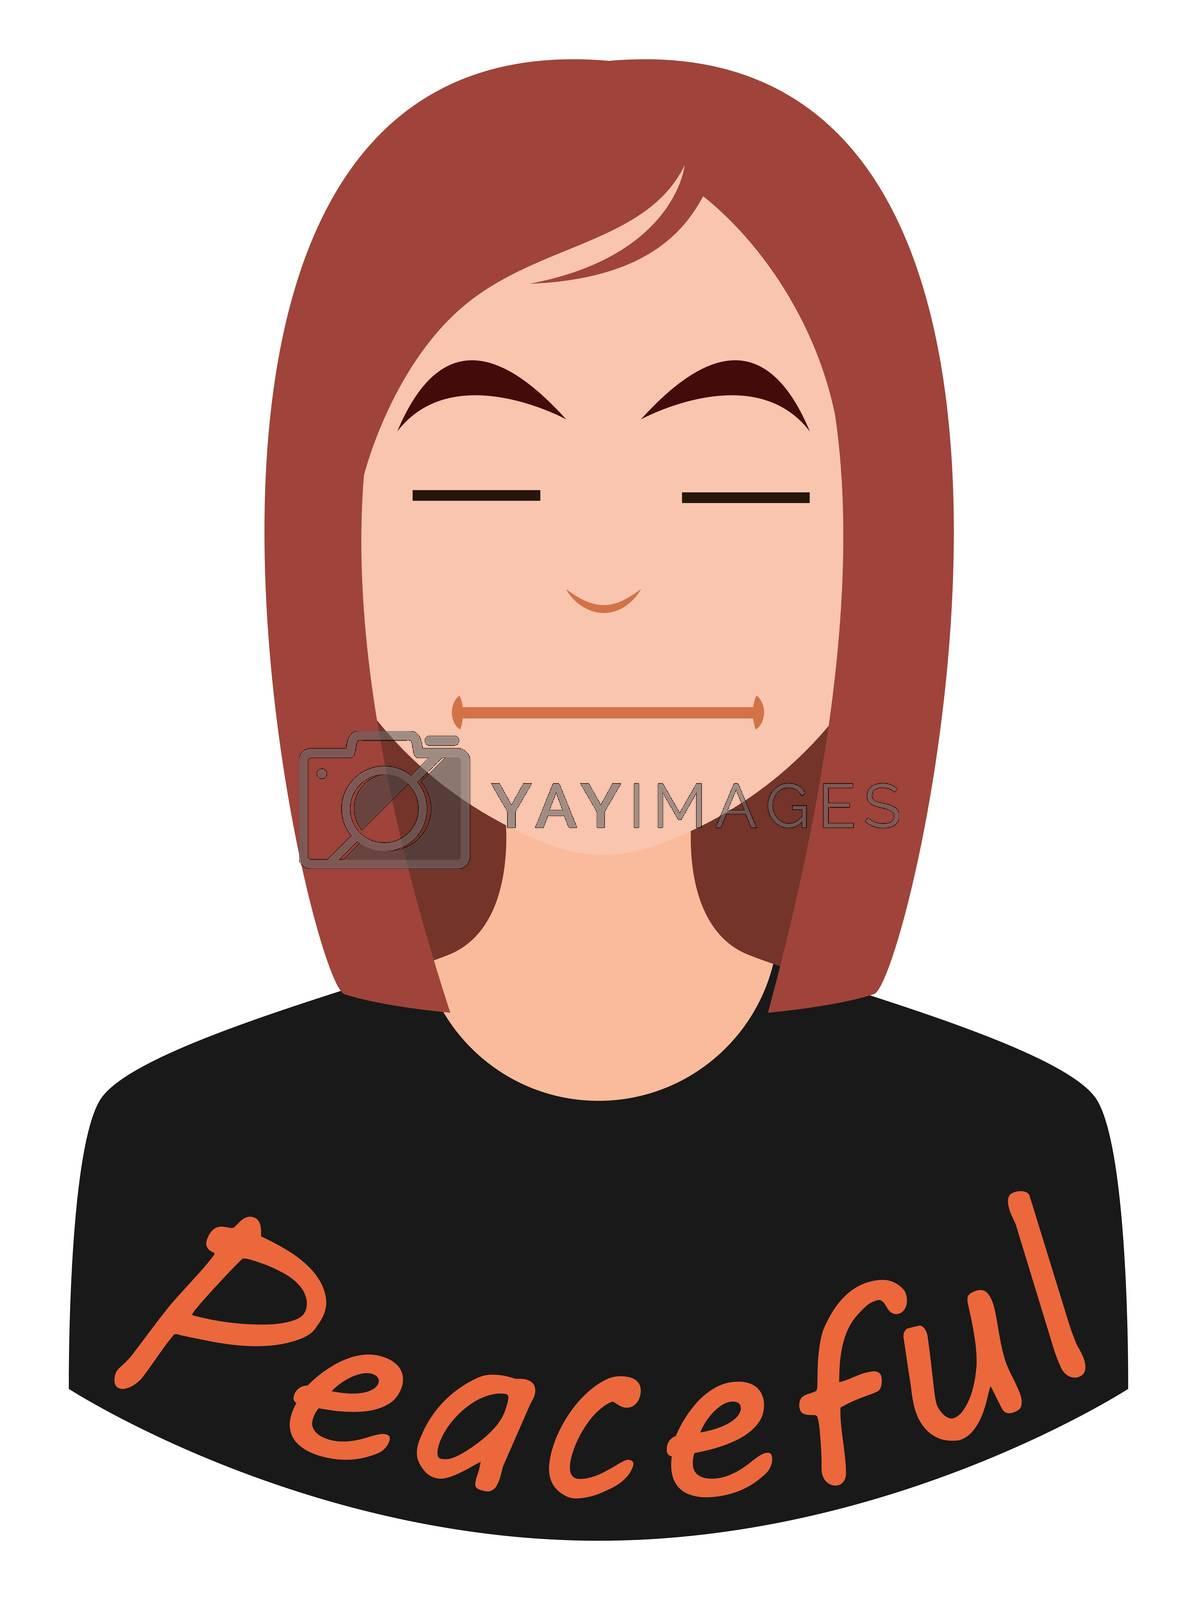 Peaceful girl emoji, illustration, vector on white background